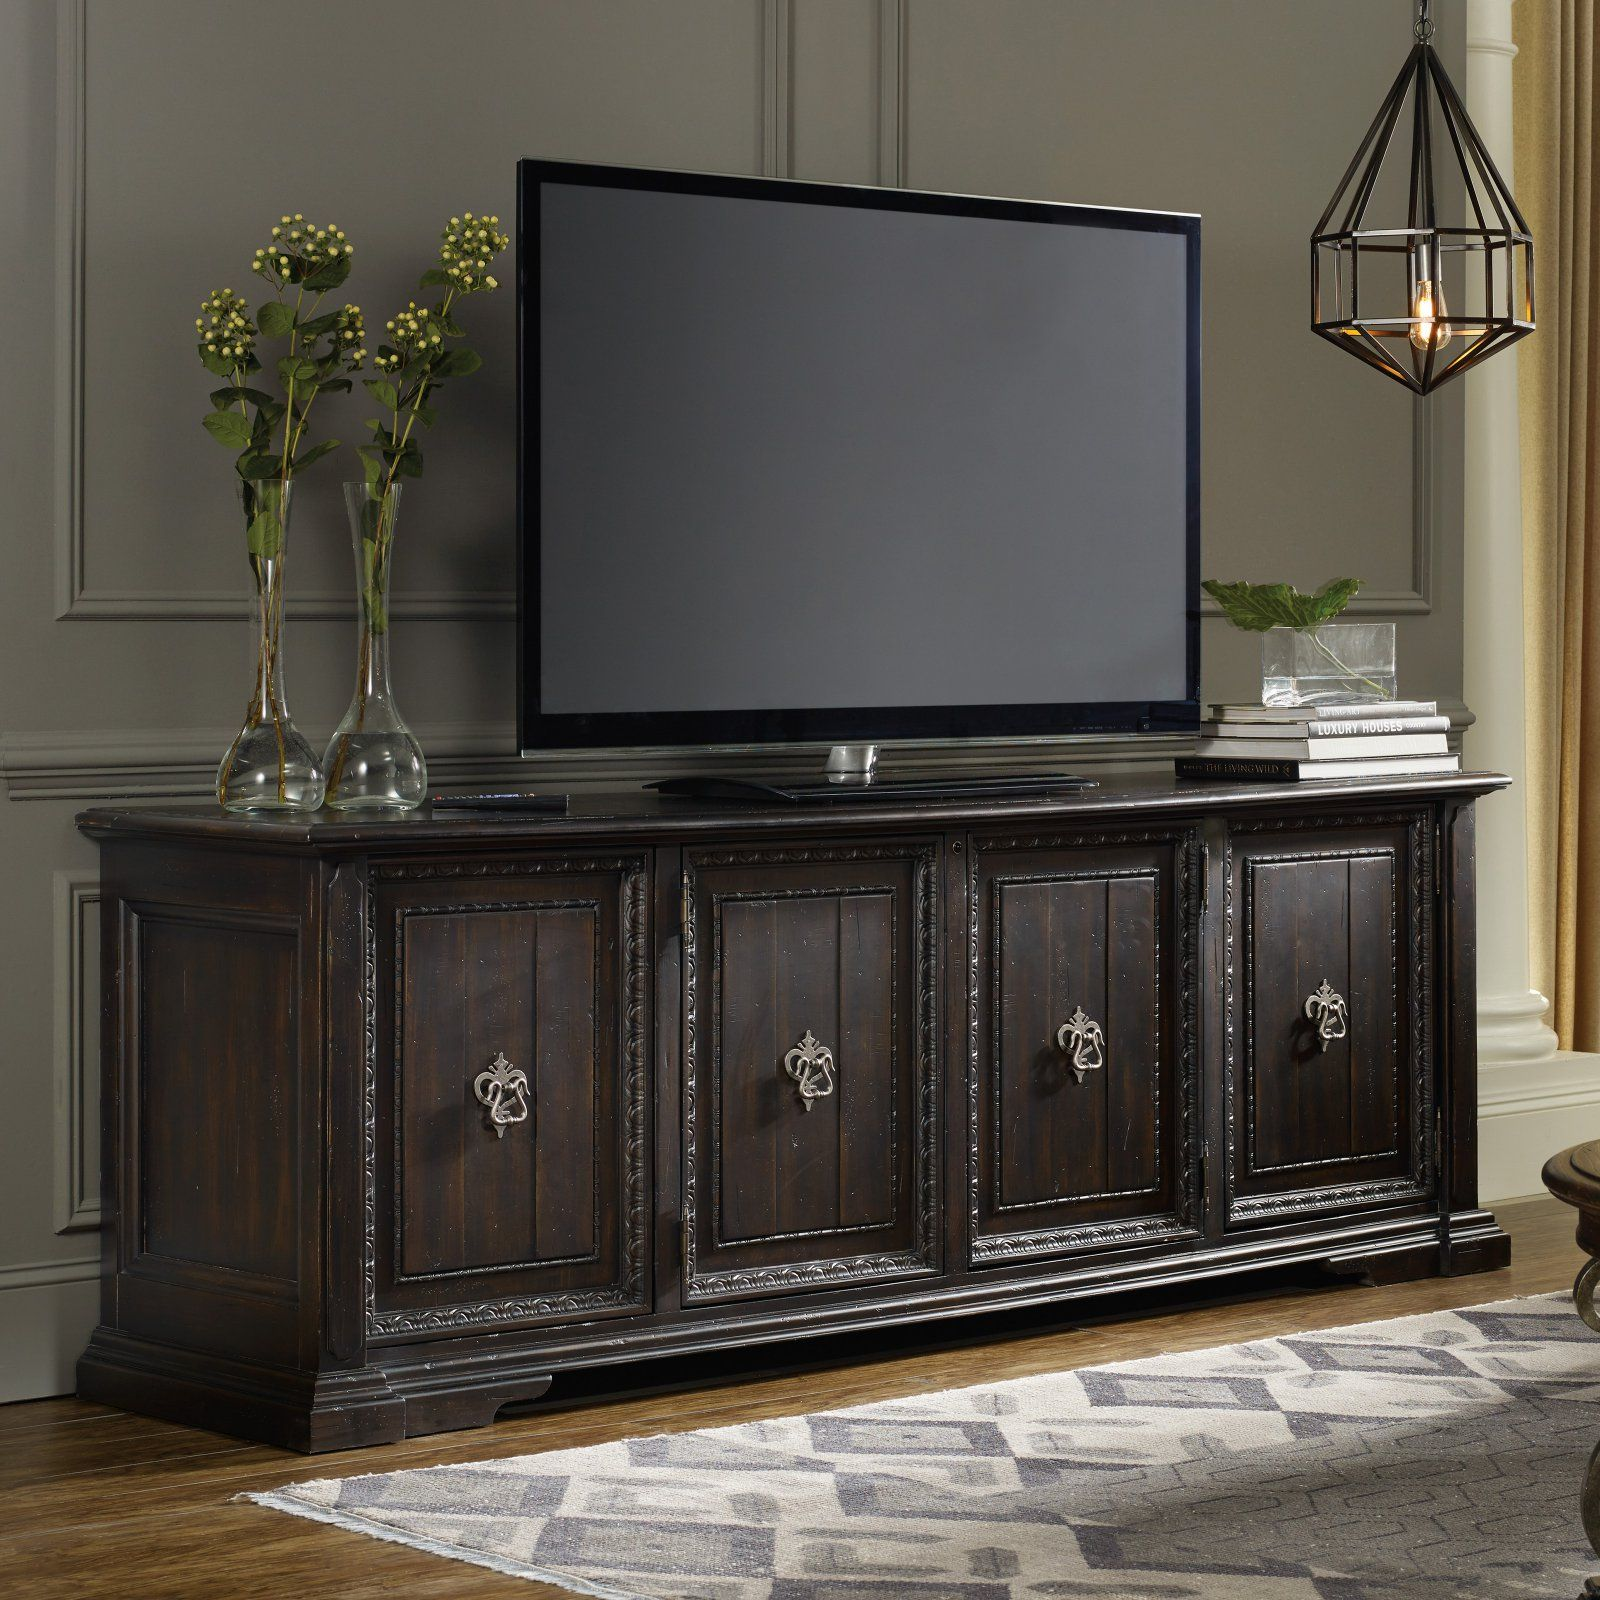 Hooker furniture treviso 4 door entertainment console